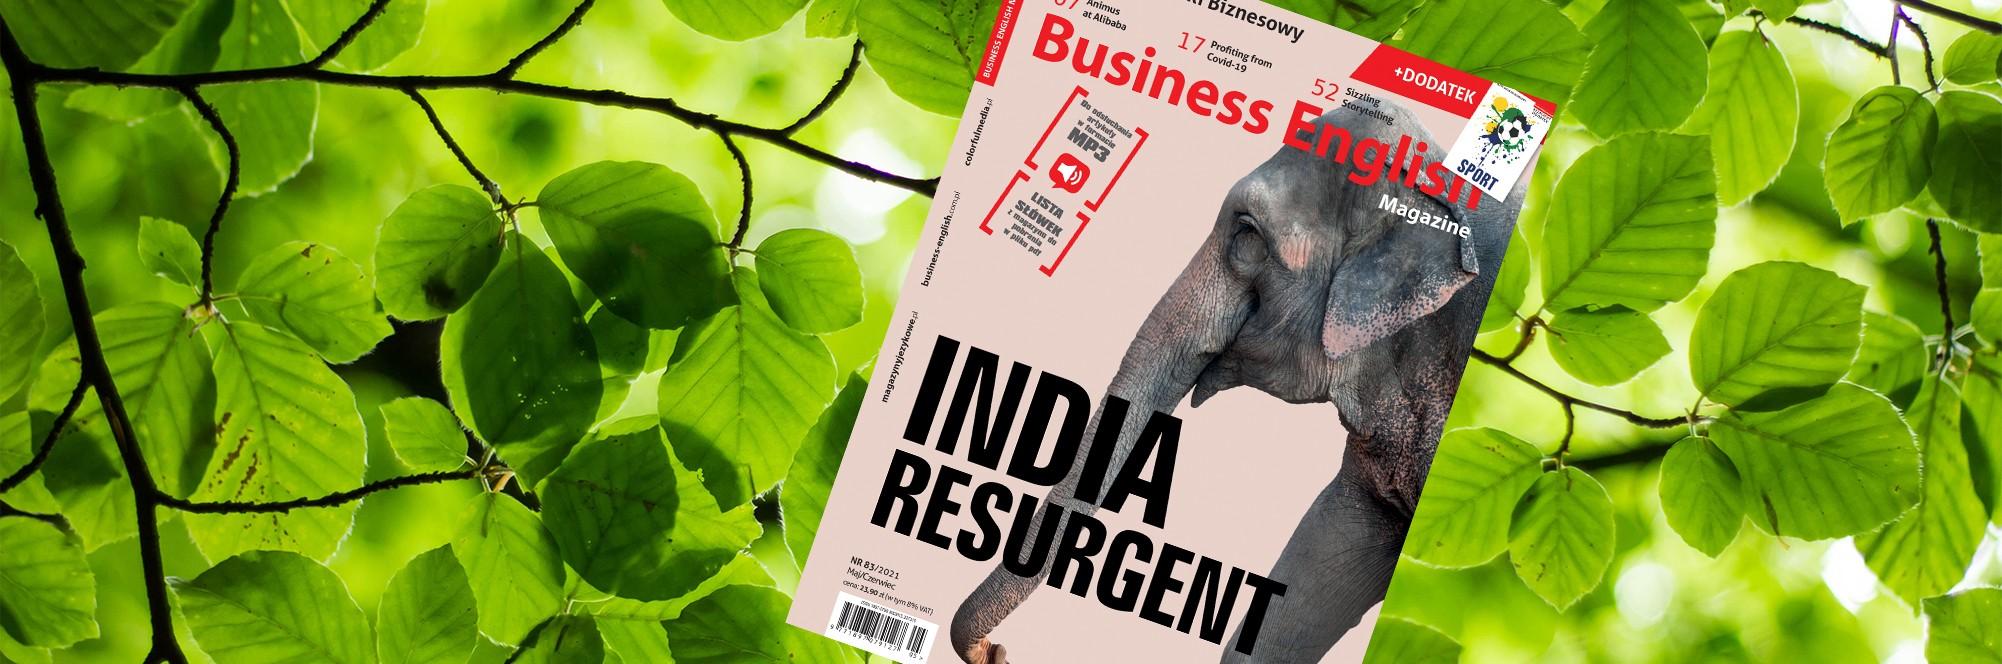 Business English Magazine 83